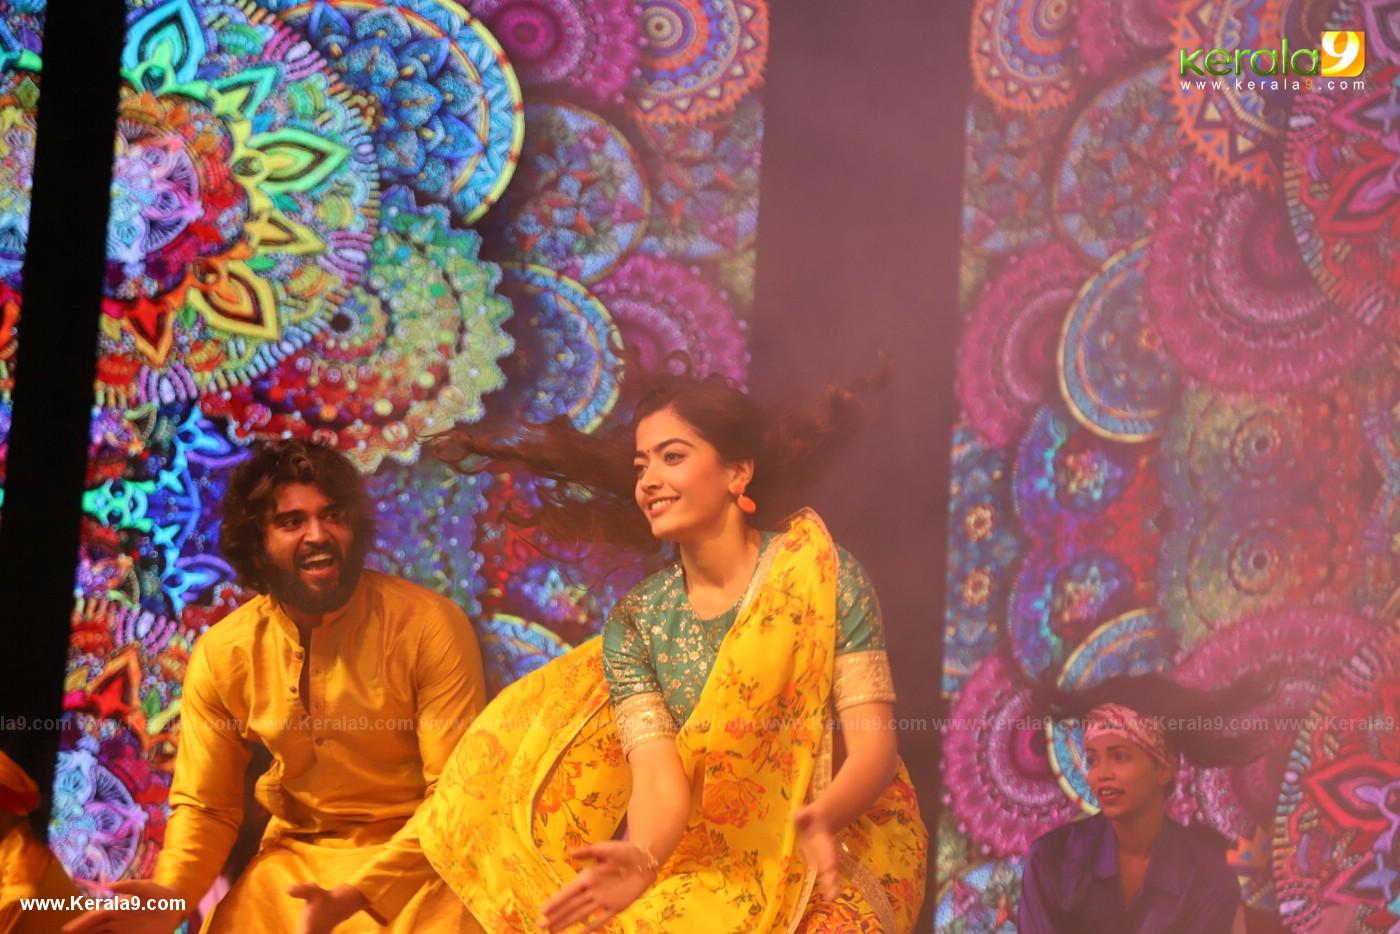 Rashmika dance at Dear Comrade movie premotion kerala kochi photos 126 1 - Kerala9.com